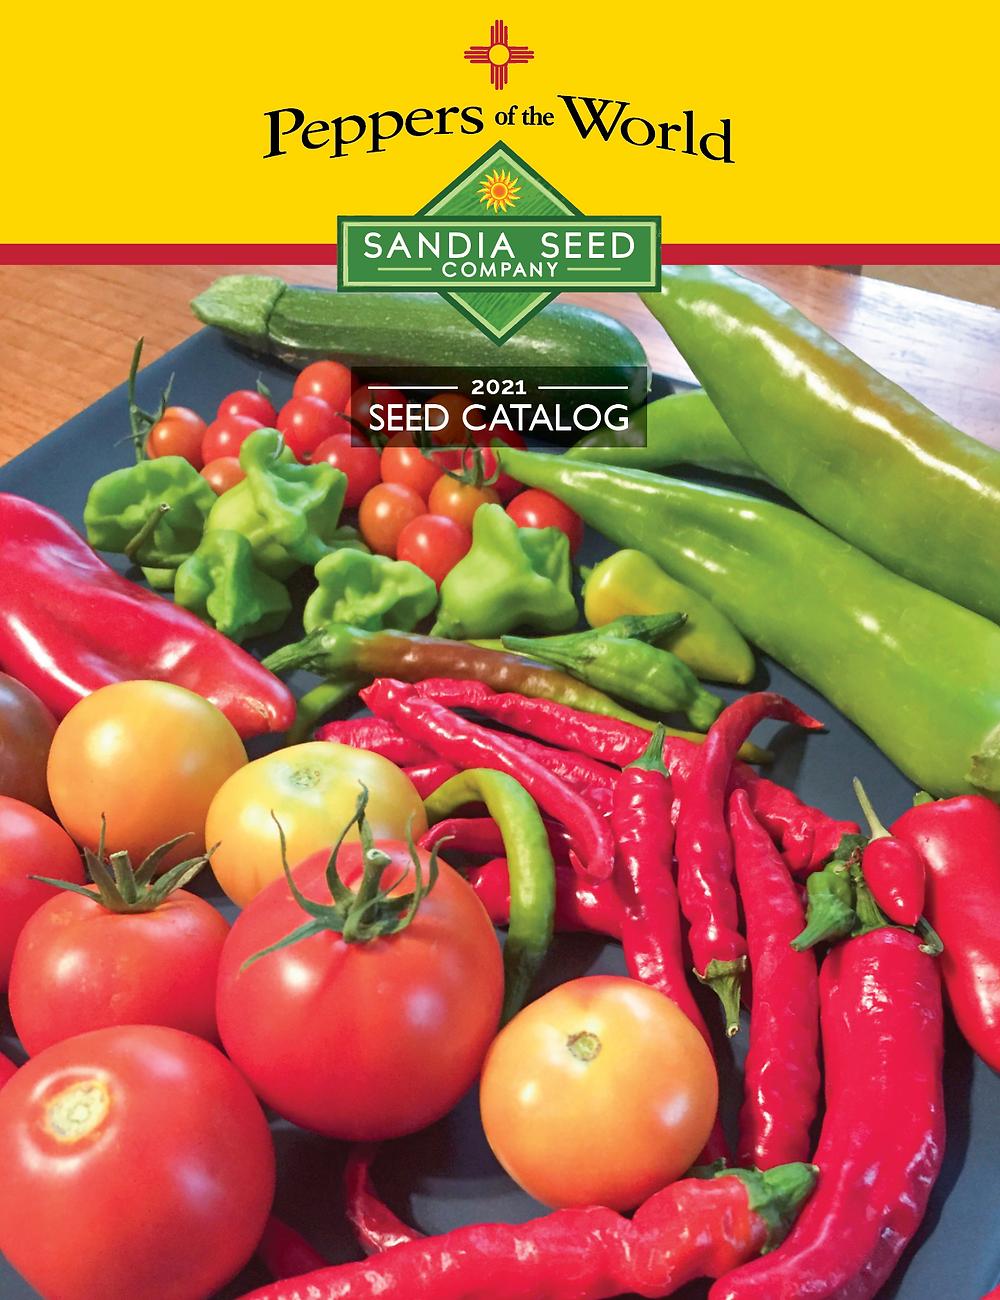 Product Catalog Design for Sandia Seed Company